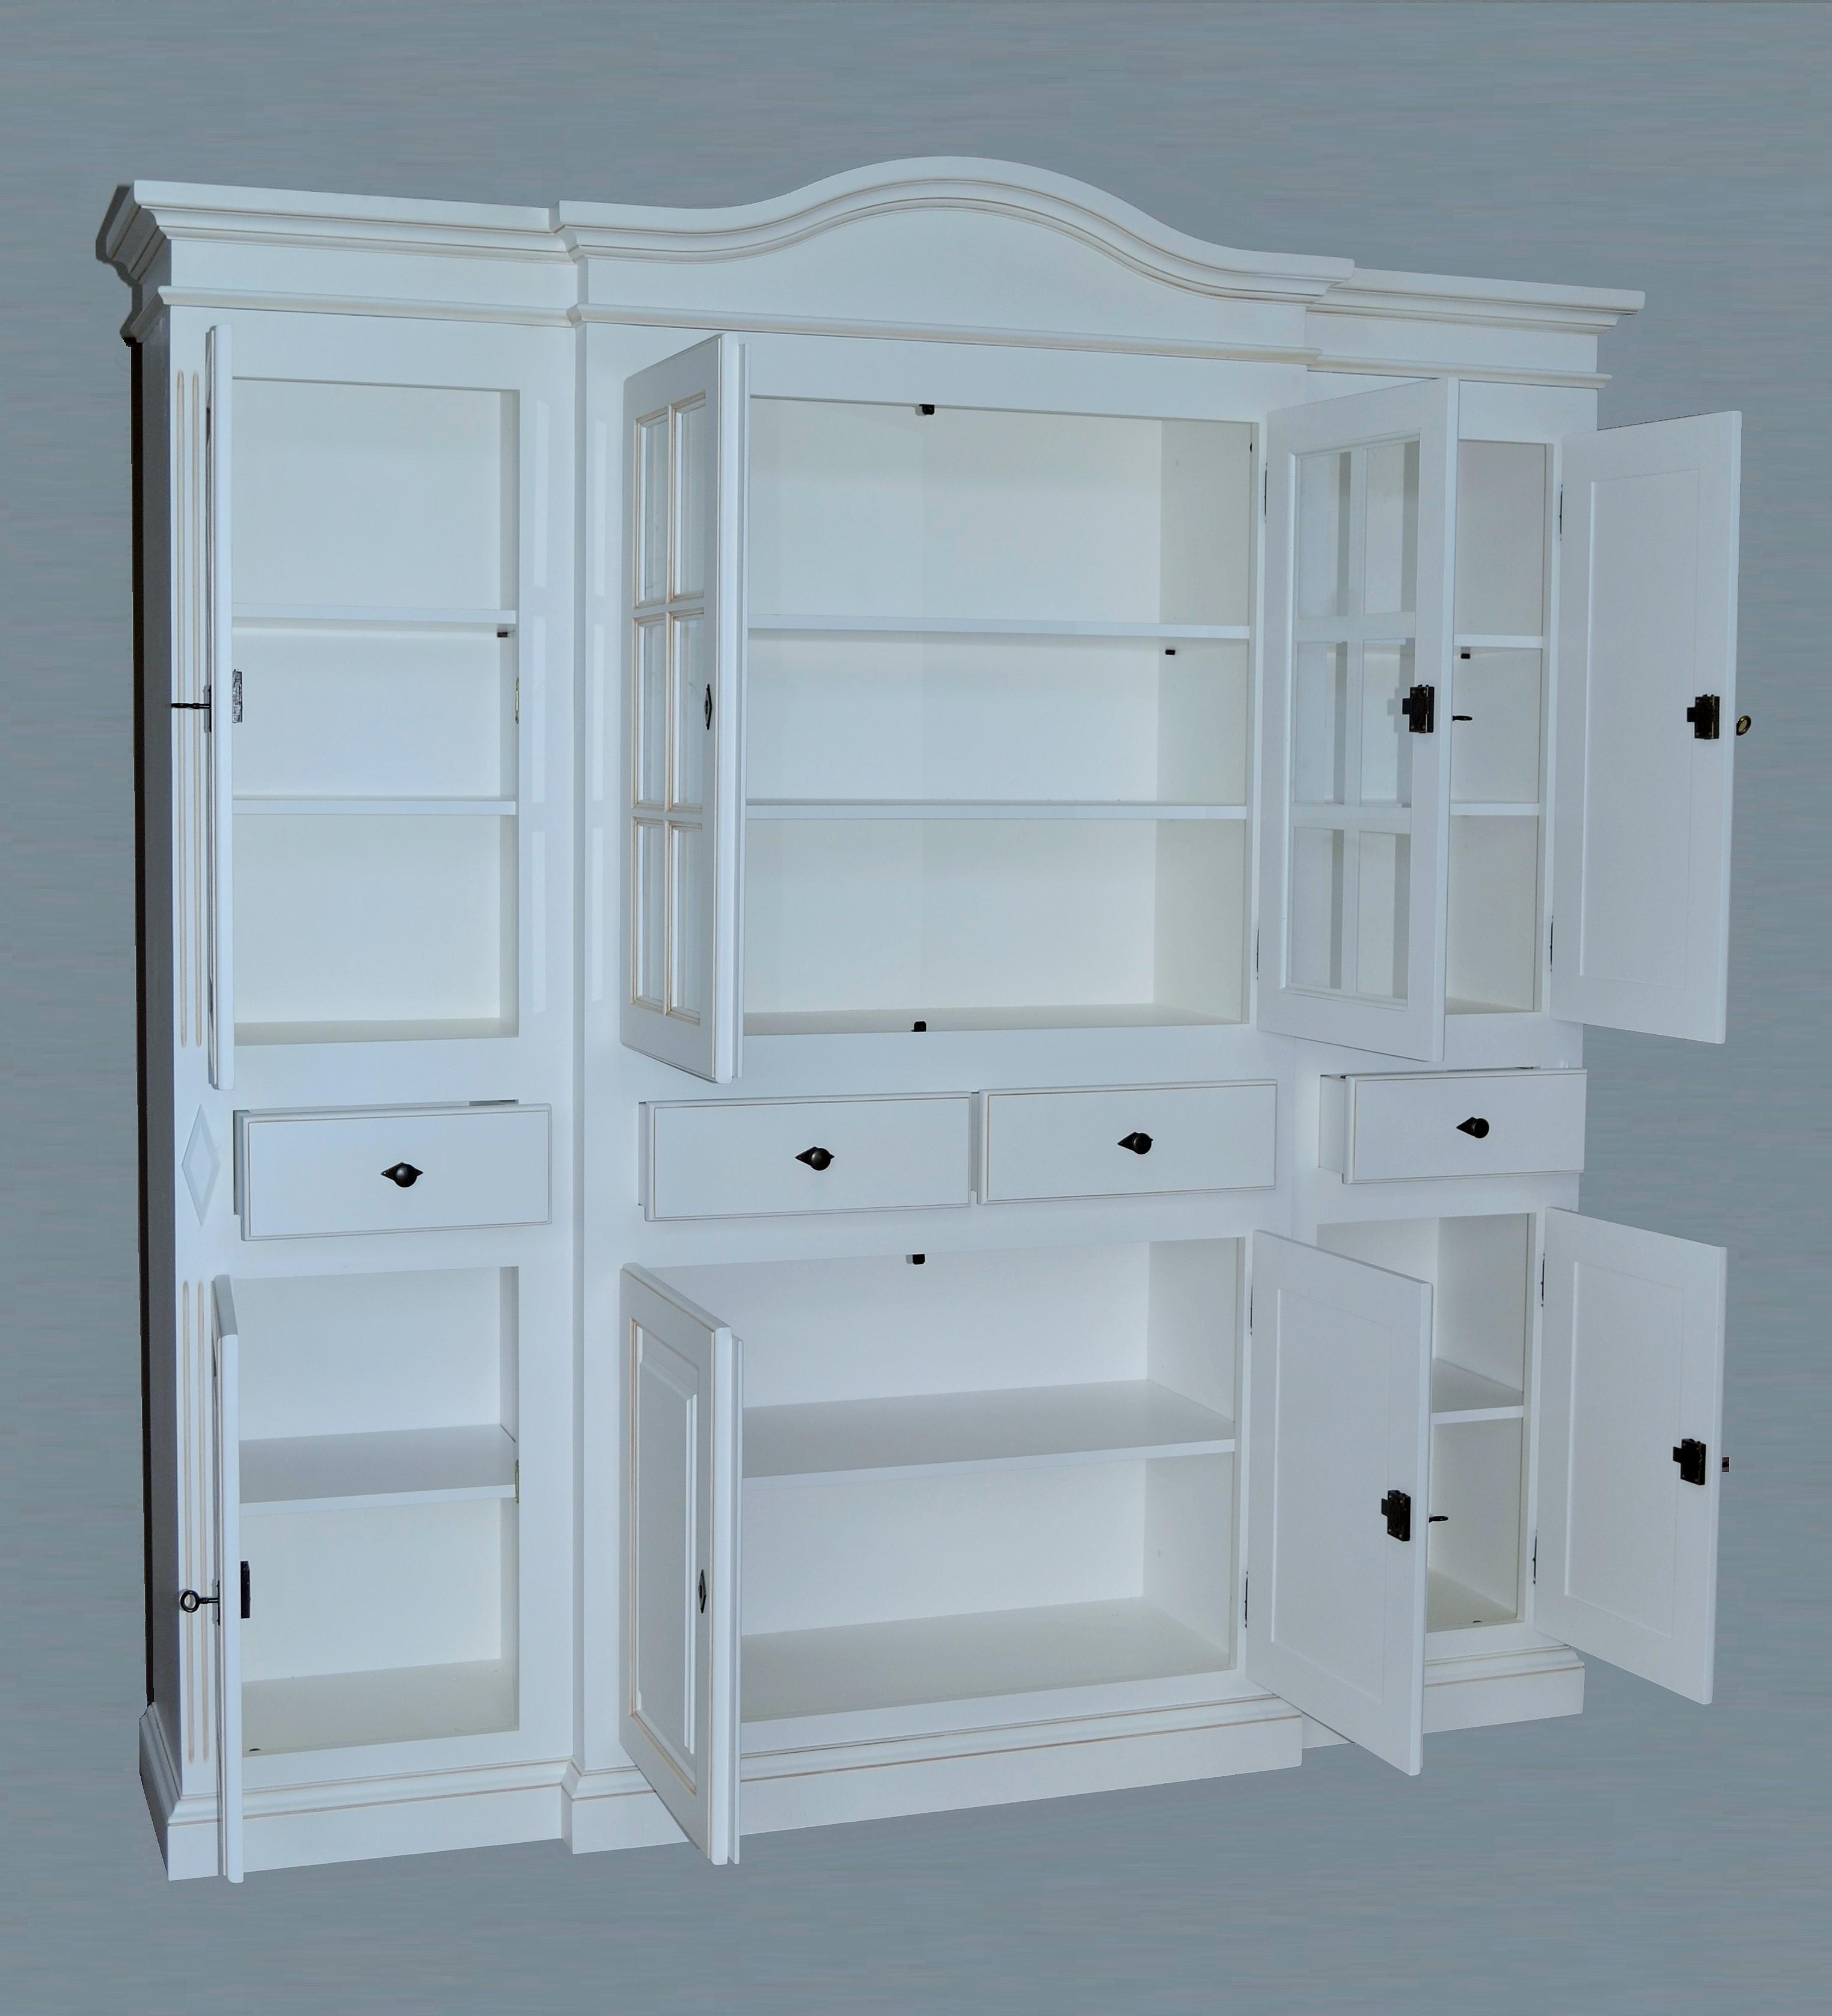 aktiv wohnwand wallersee anbauwand schrankwand. Black Bedroom Furniture Sets. Home Design Ideas